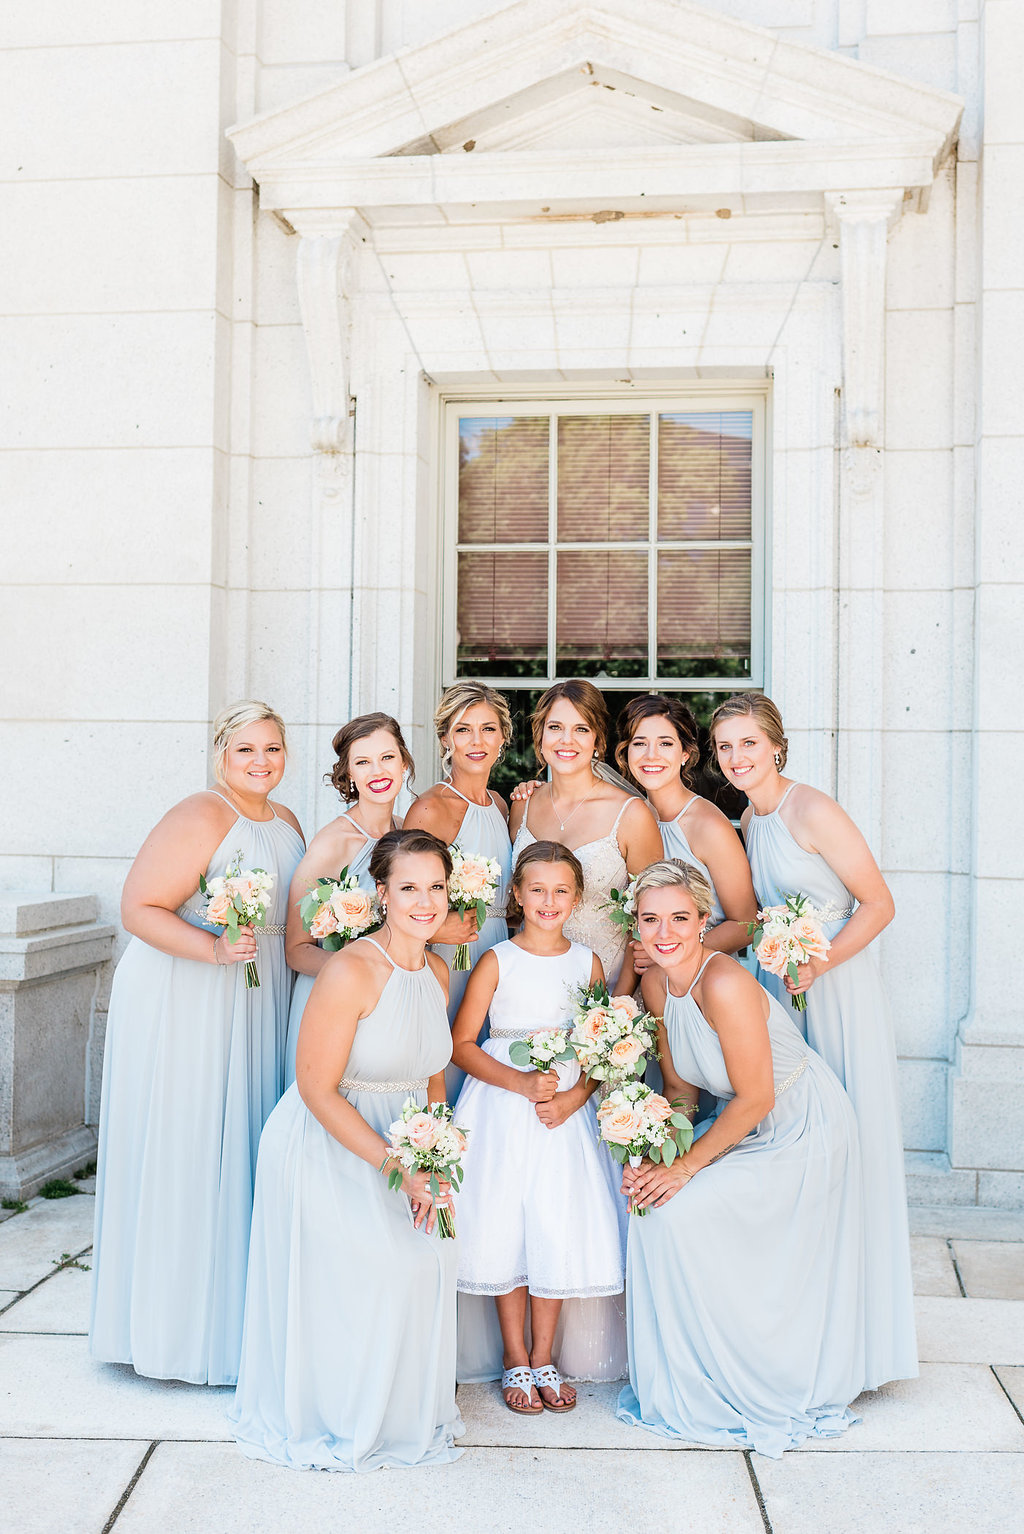 Union-South-Wedding-Photographers-sd-046.jpg